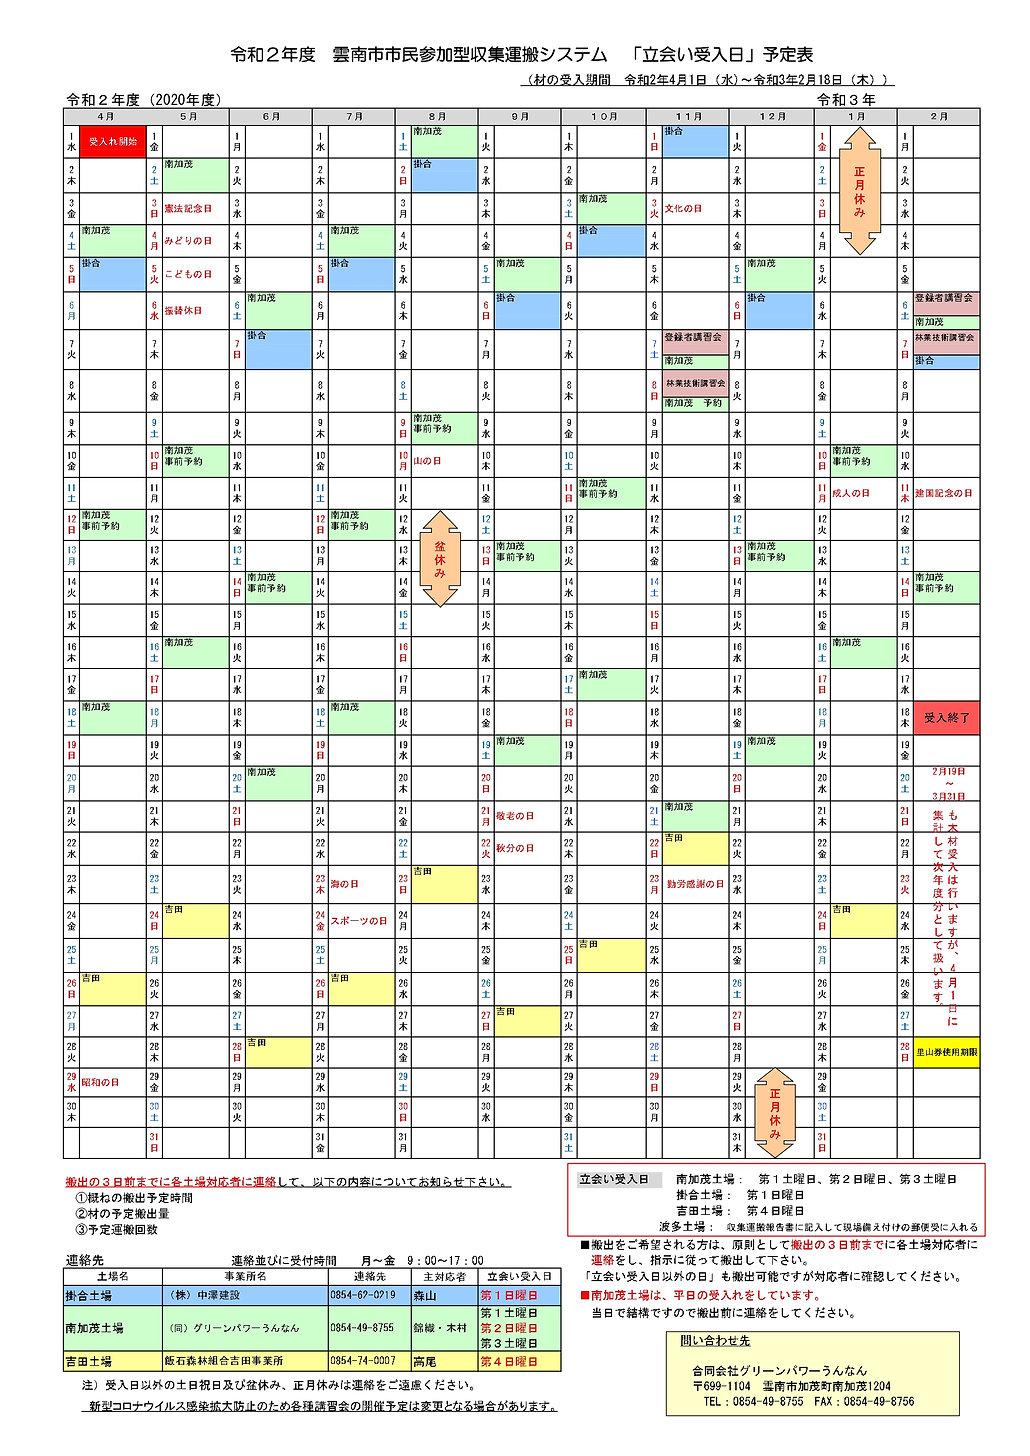 ■令和2年度立会い受入日予定表 2020 (1)_page-0001.jpg